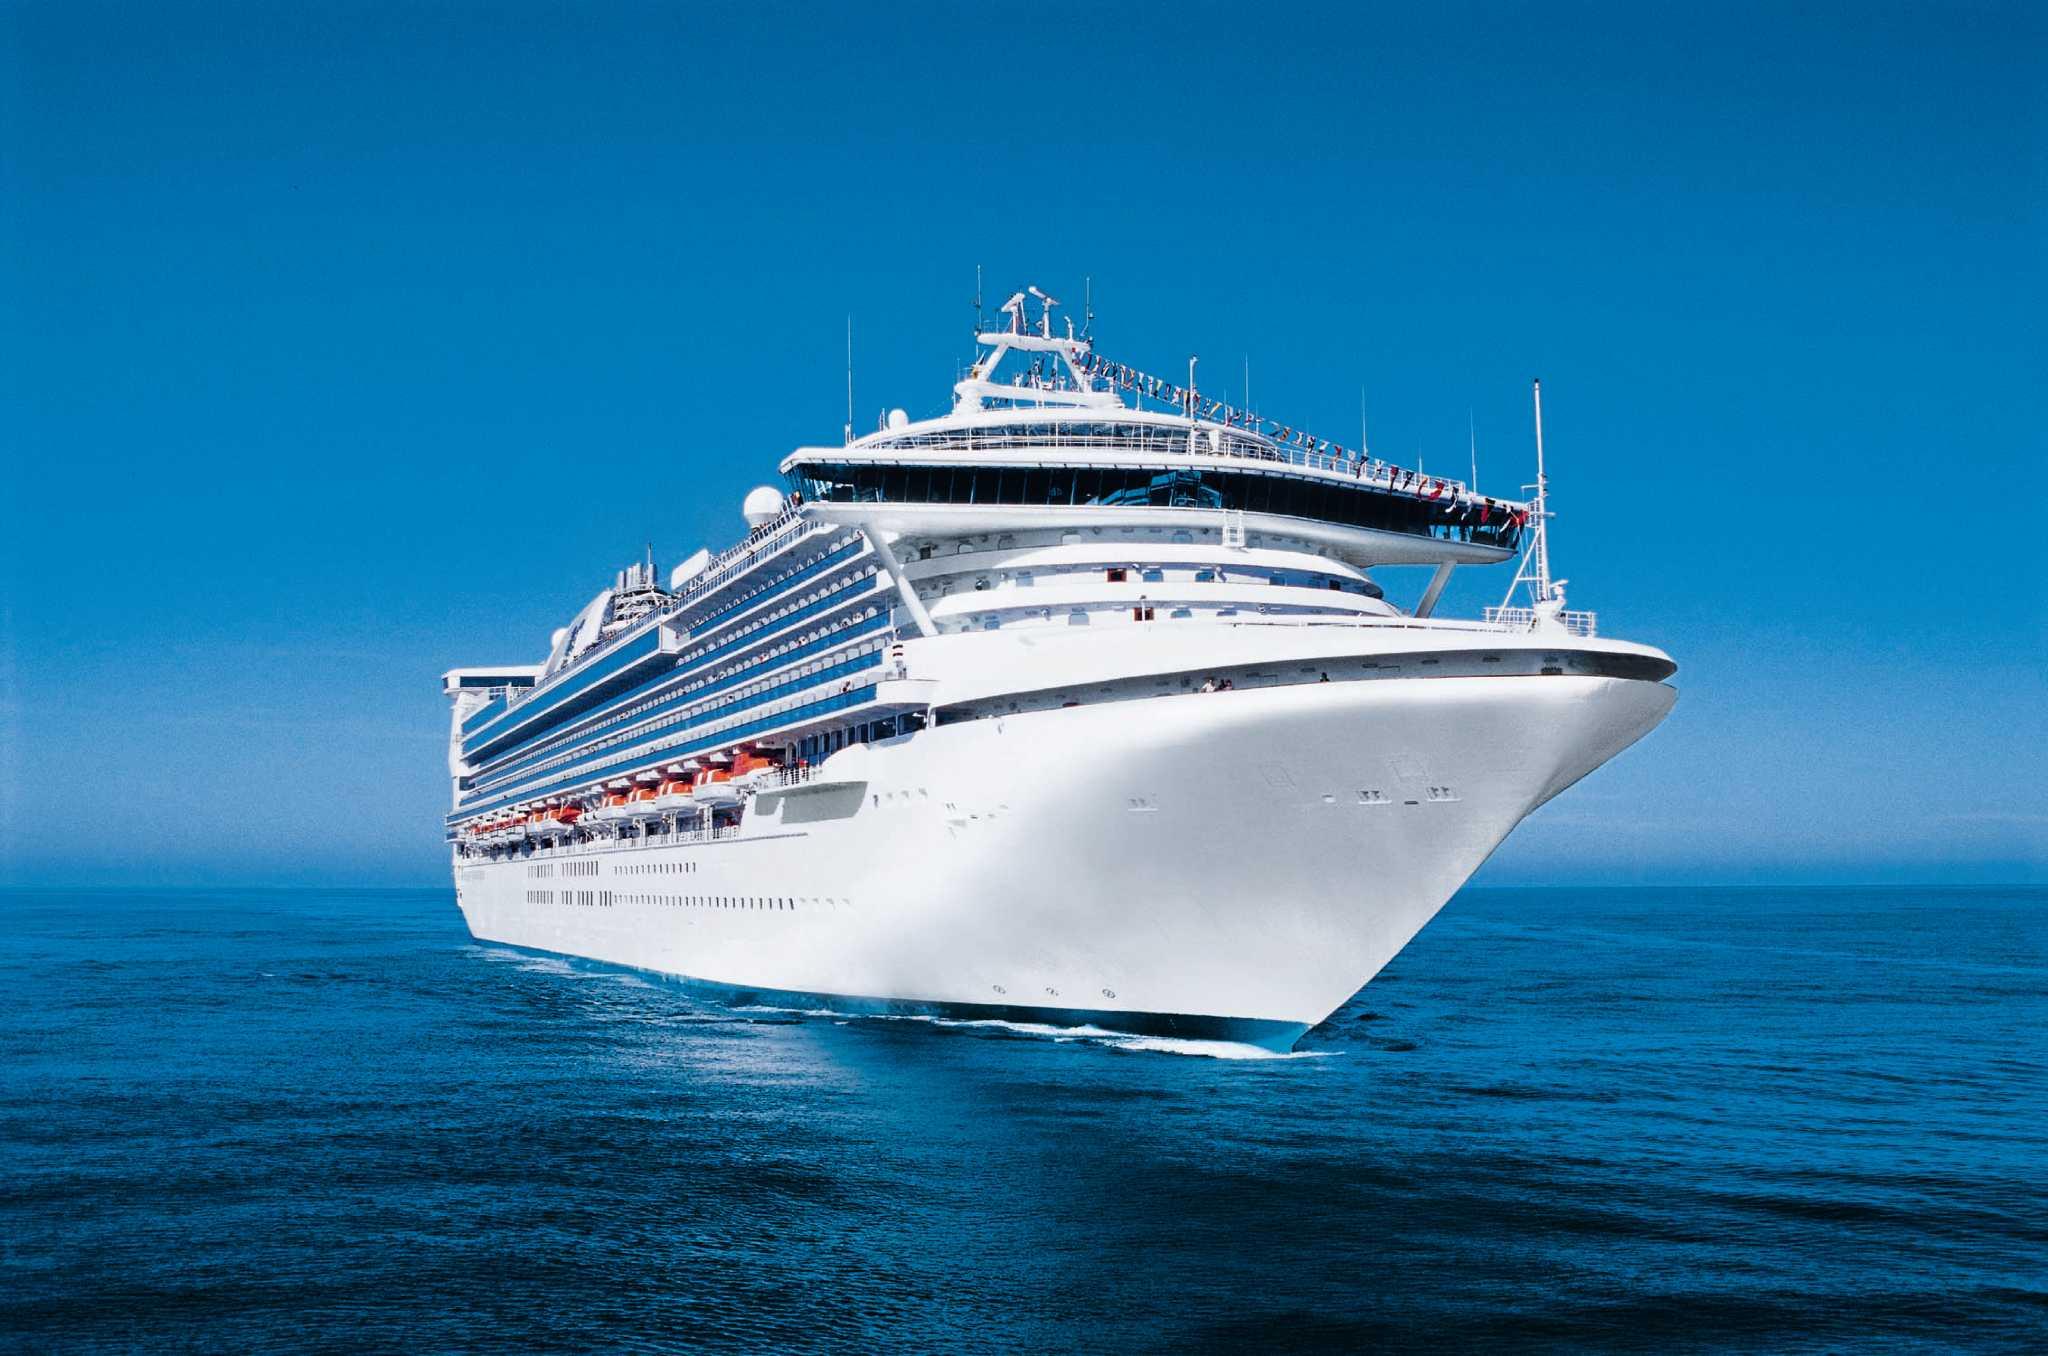 Princess Cruise Ship Opens Bayport's First Cruise Season